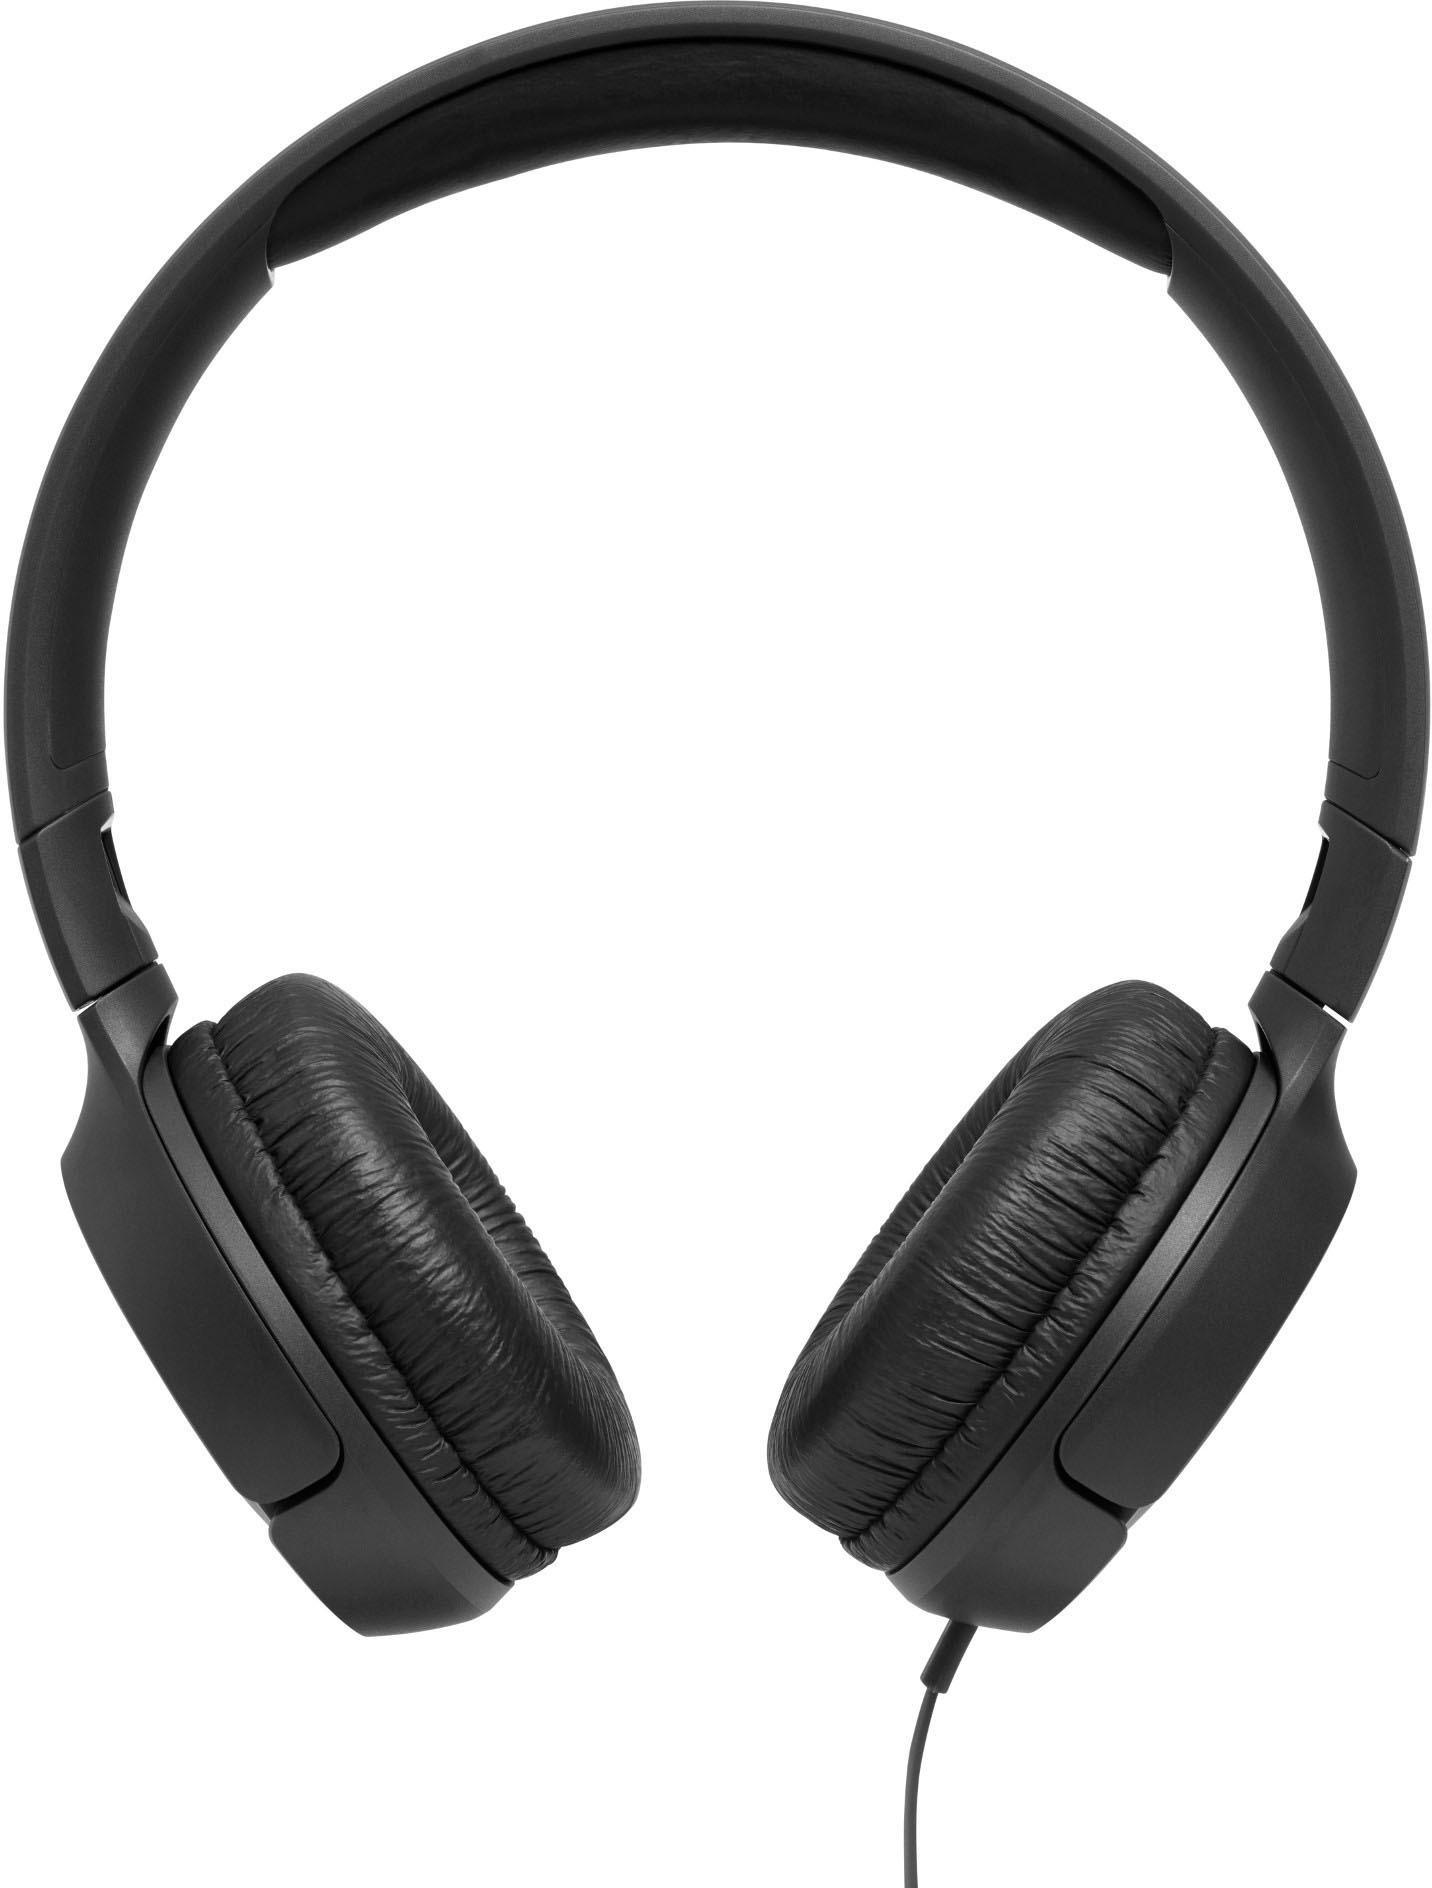 JBL »Tune 500« on-ear-hoofdtelefoon (bedraad, spraakbesturing, geïntegreerde microfoon) goedkoop op otto.nl kopen